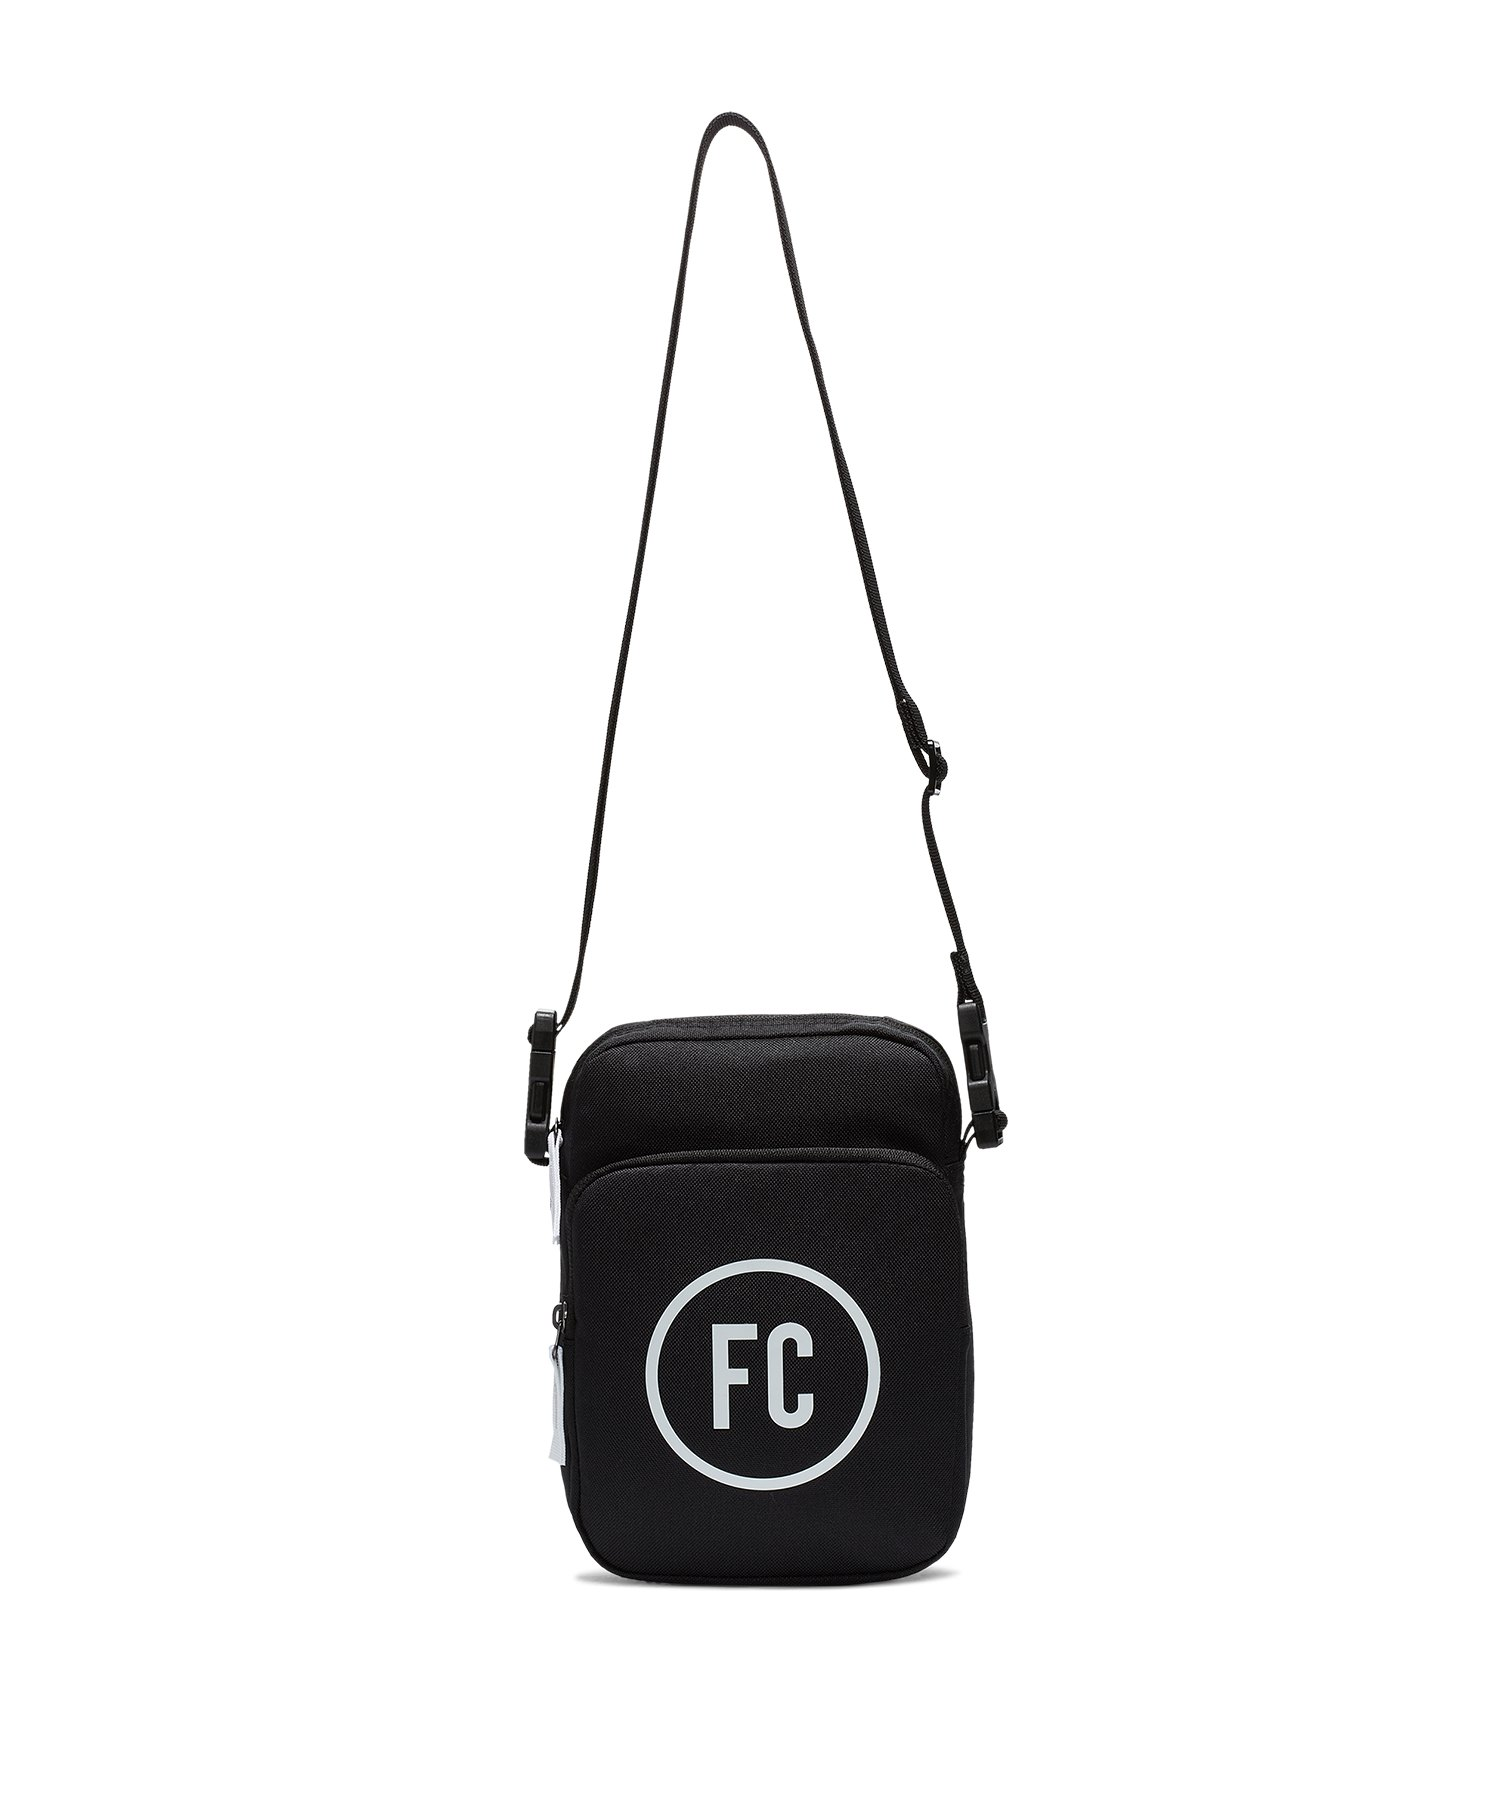 Nike F.C. HO19 Bag Tasche Schwarz F010 - schwarz